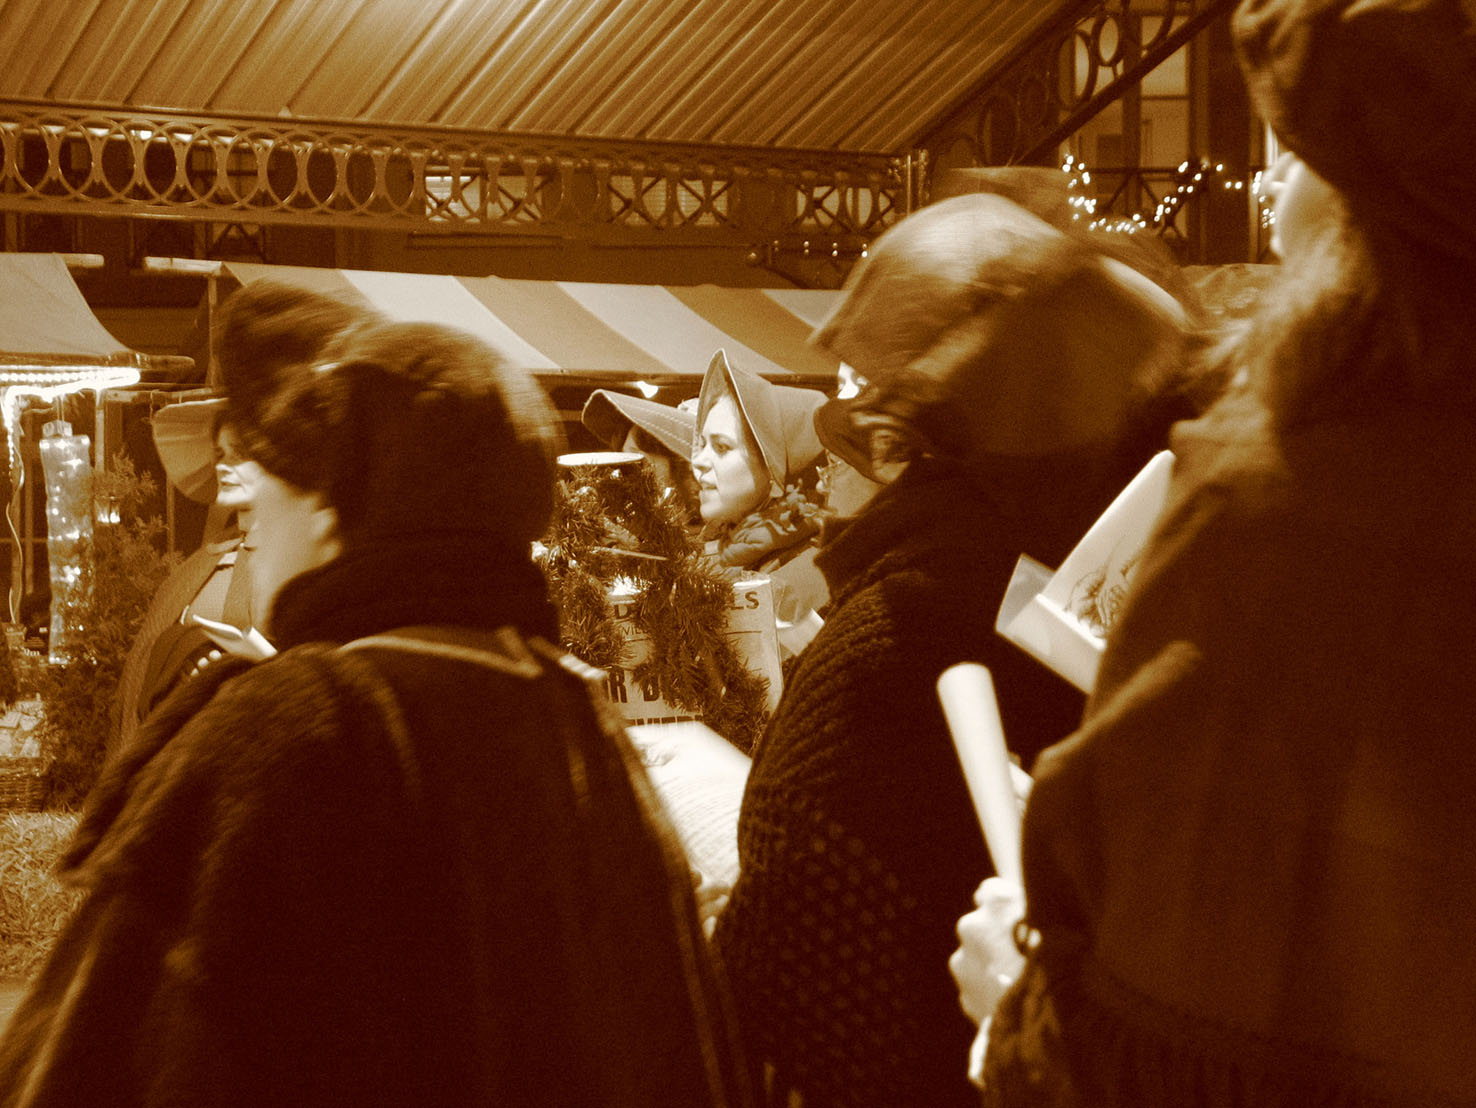 165 - Kerstmarkt Helmond 2003.jpg